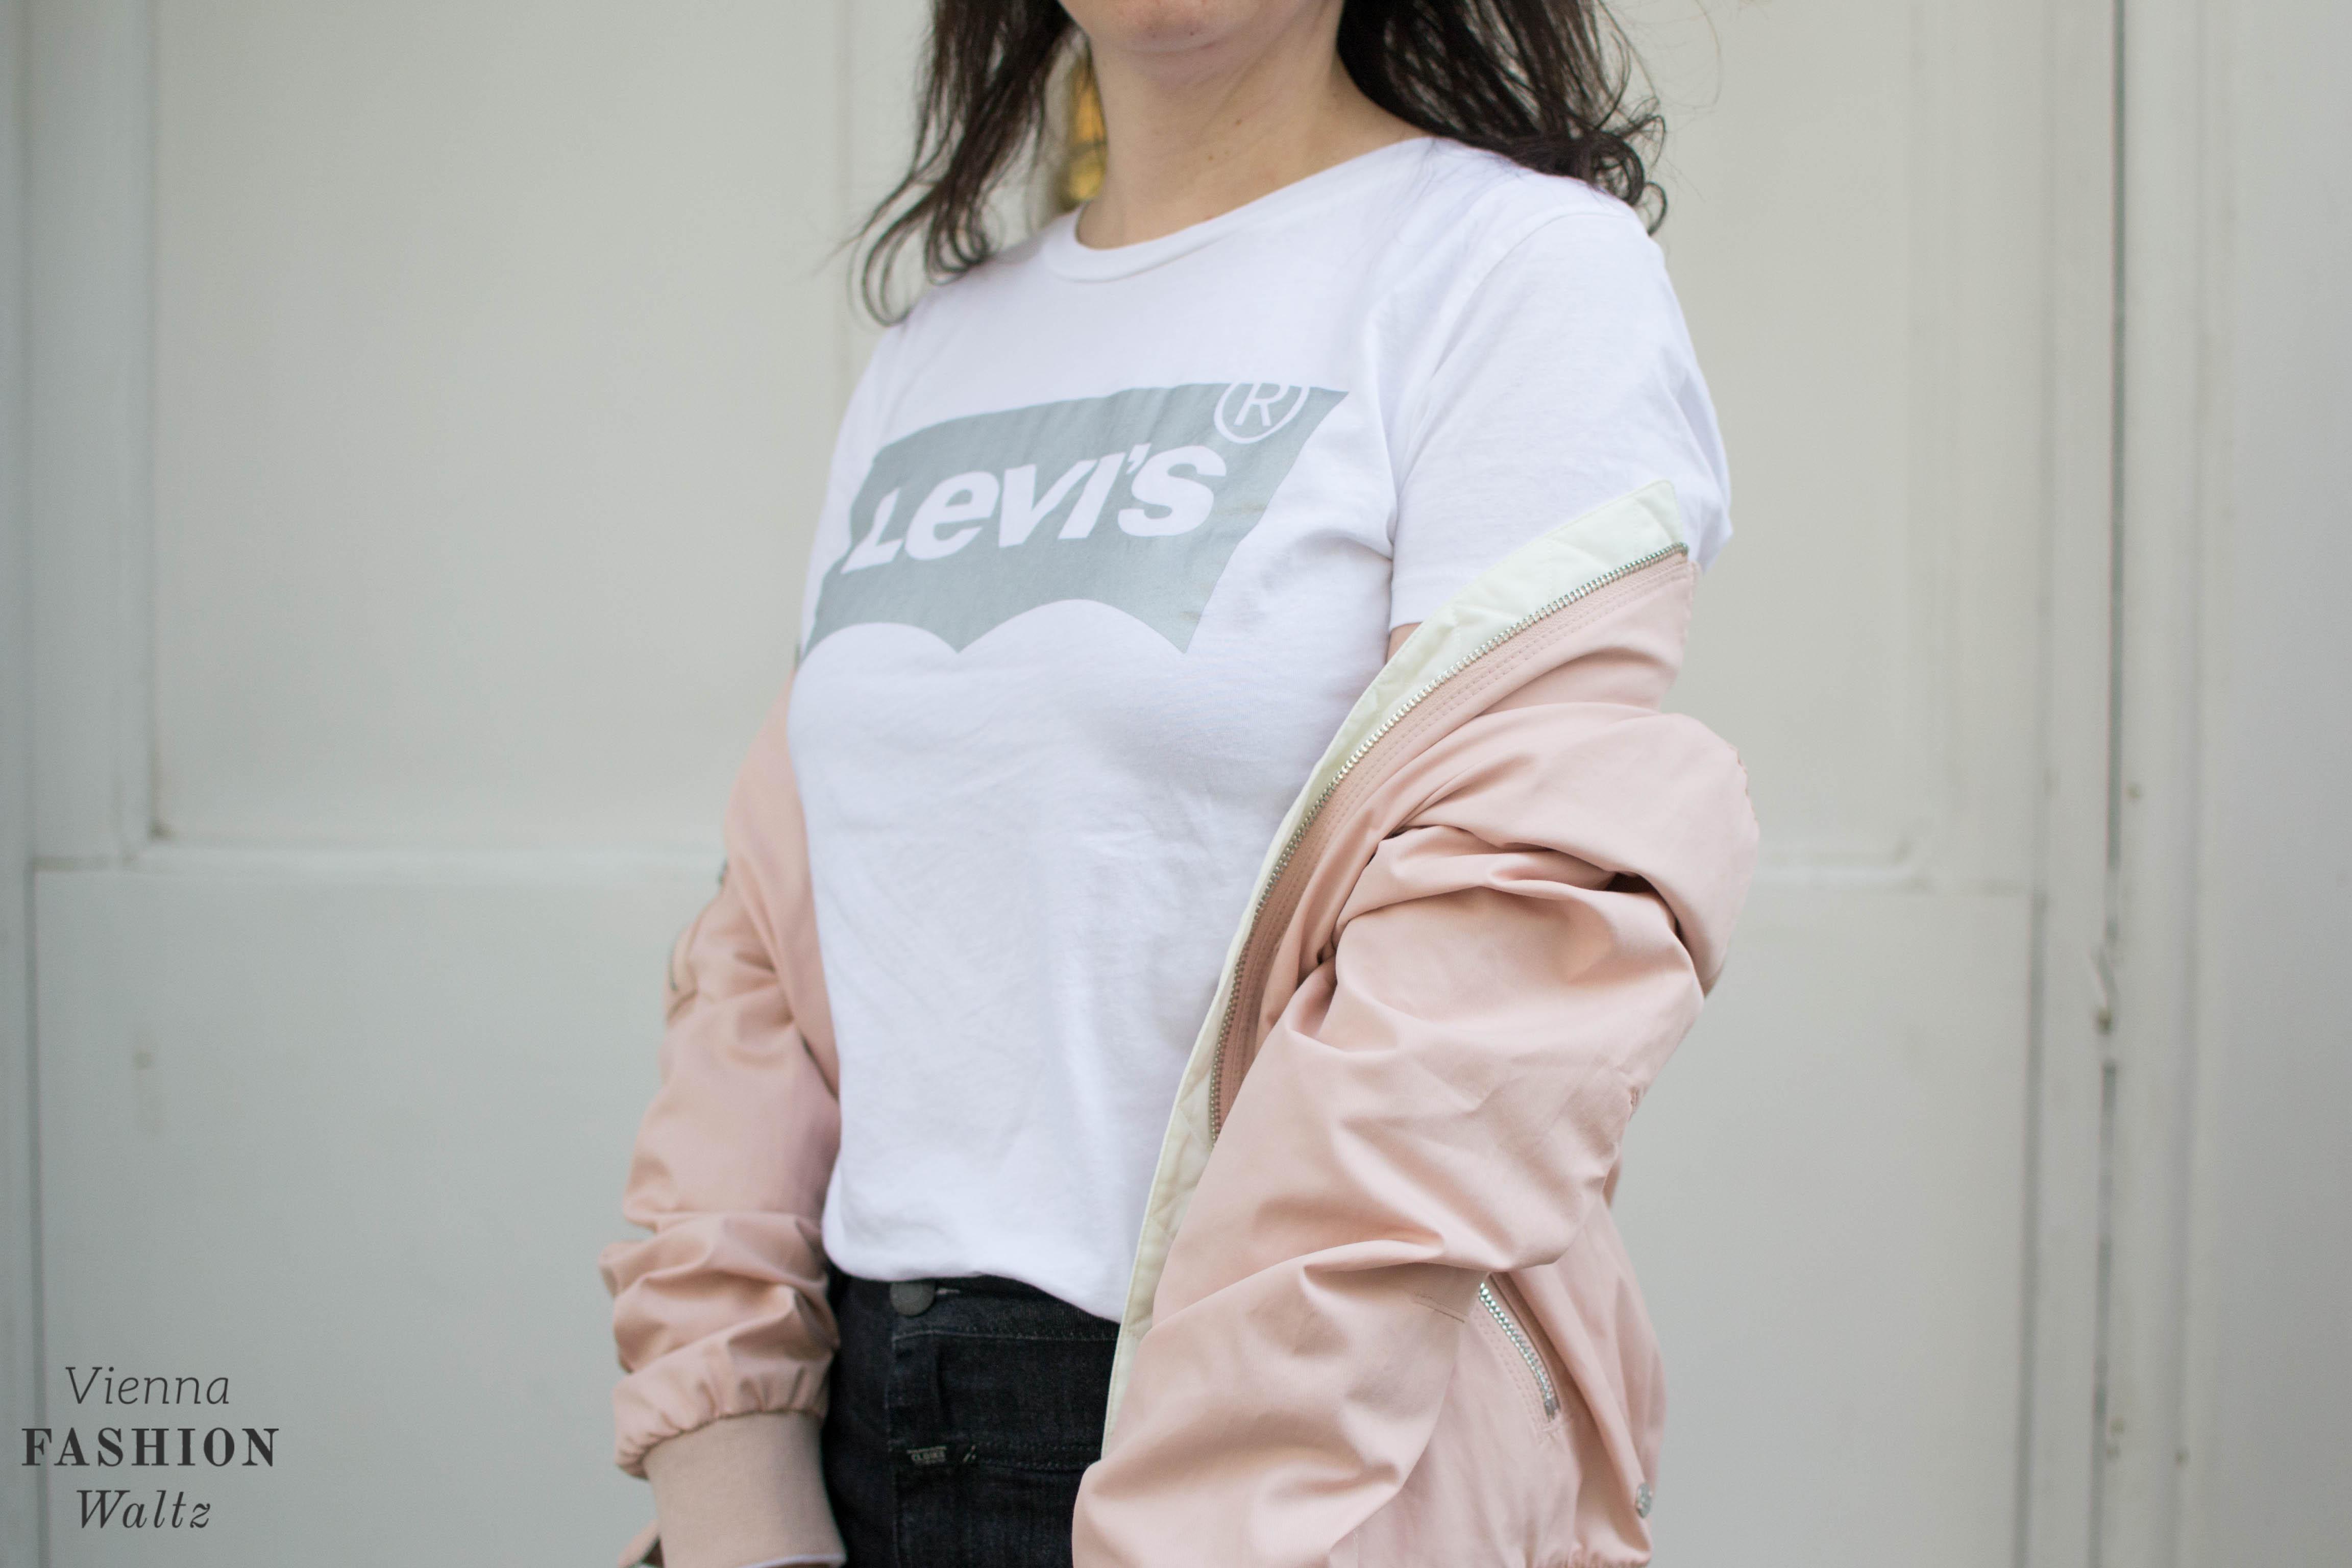 bomberjacket closed jeans aigner munich missoni viennafashionwaltz.com